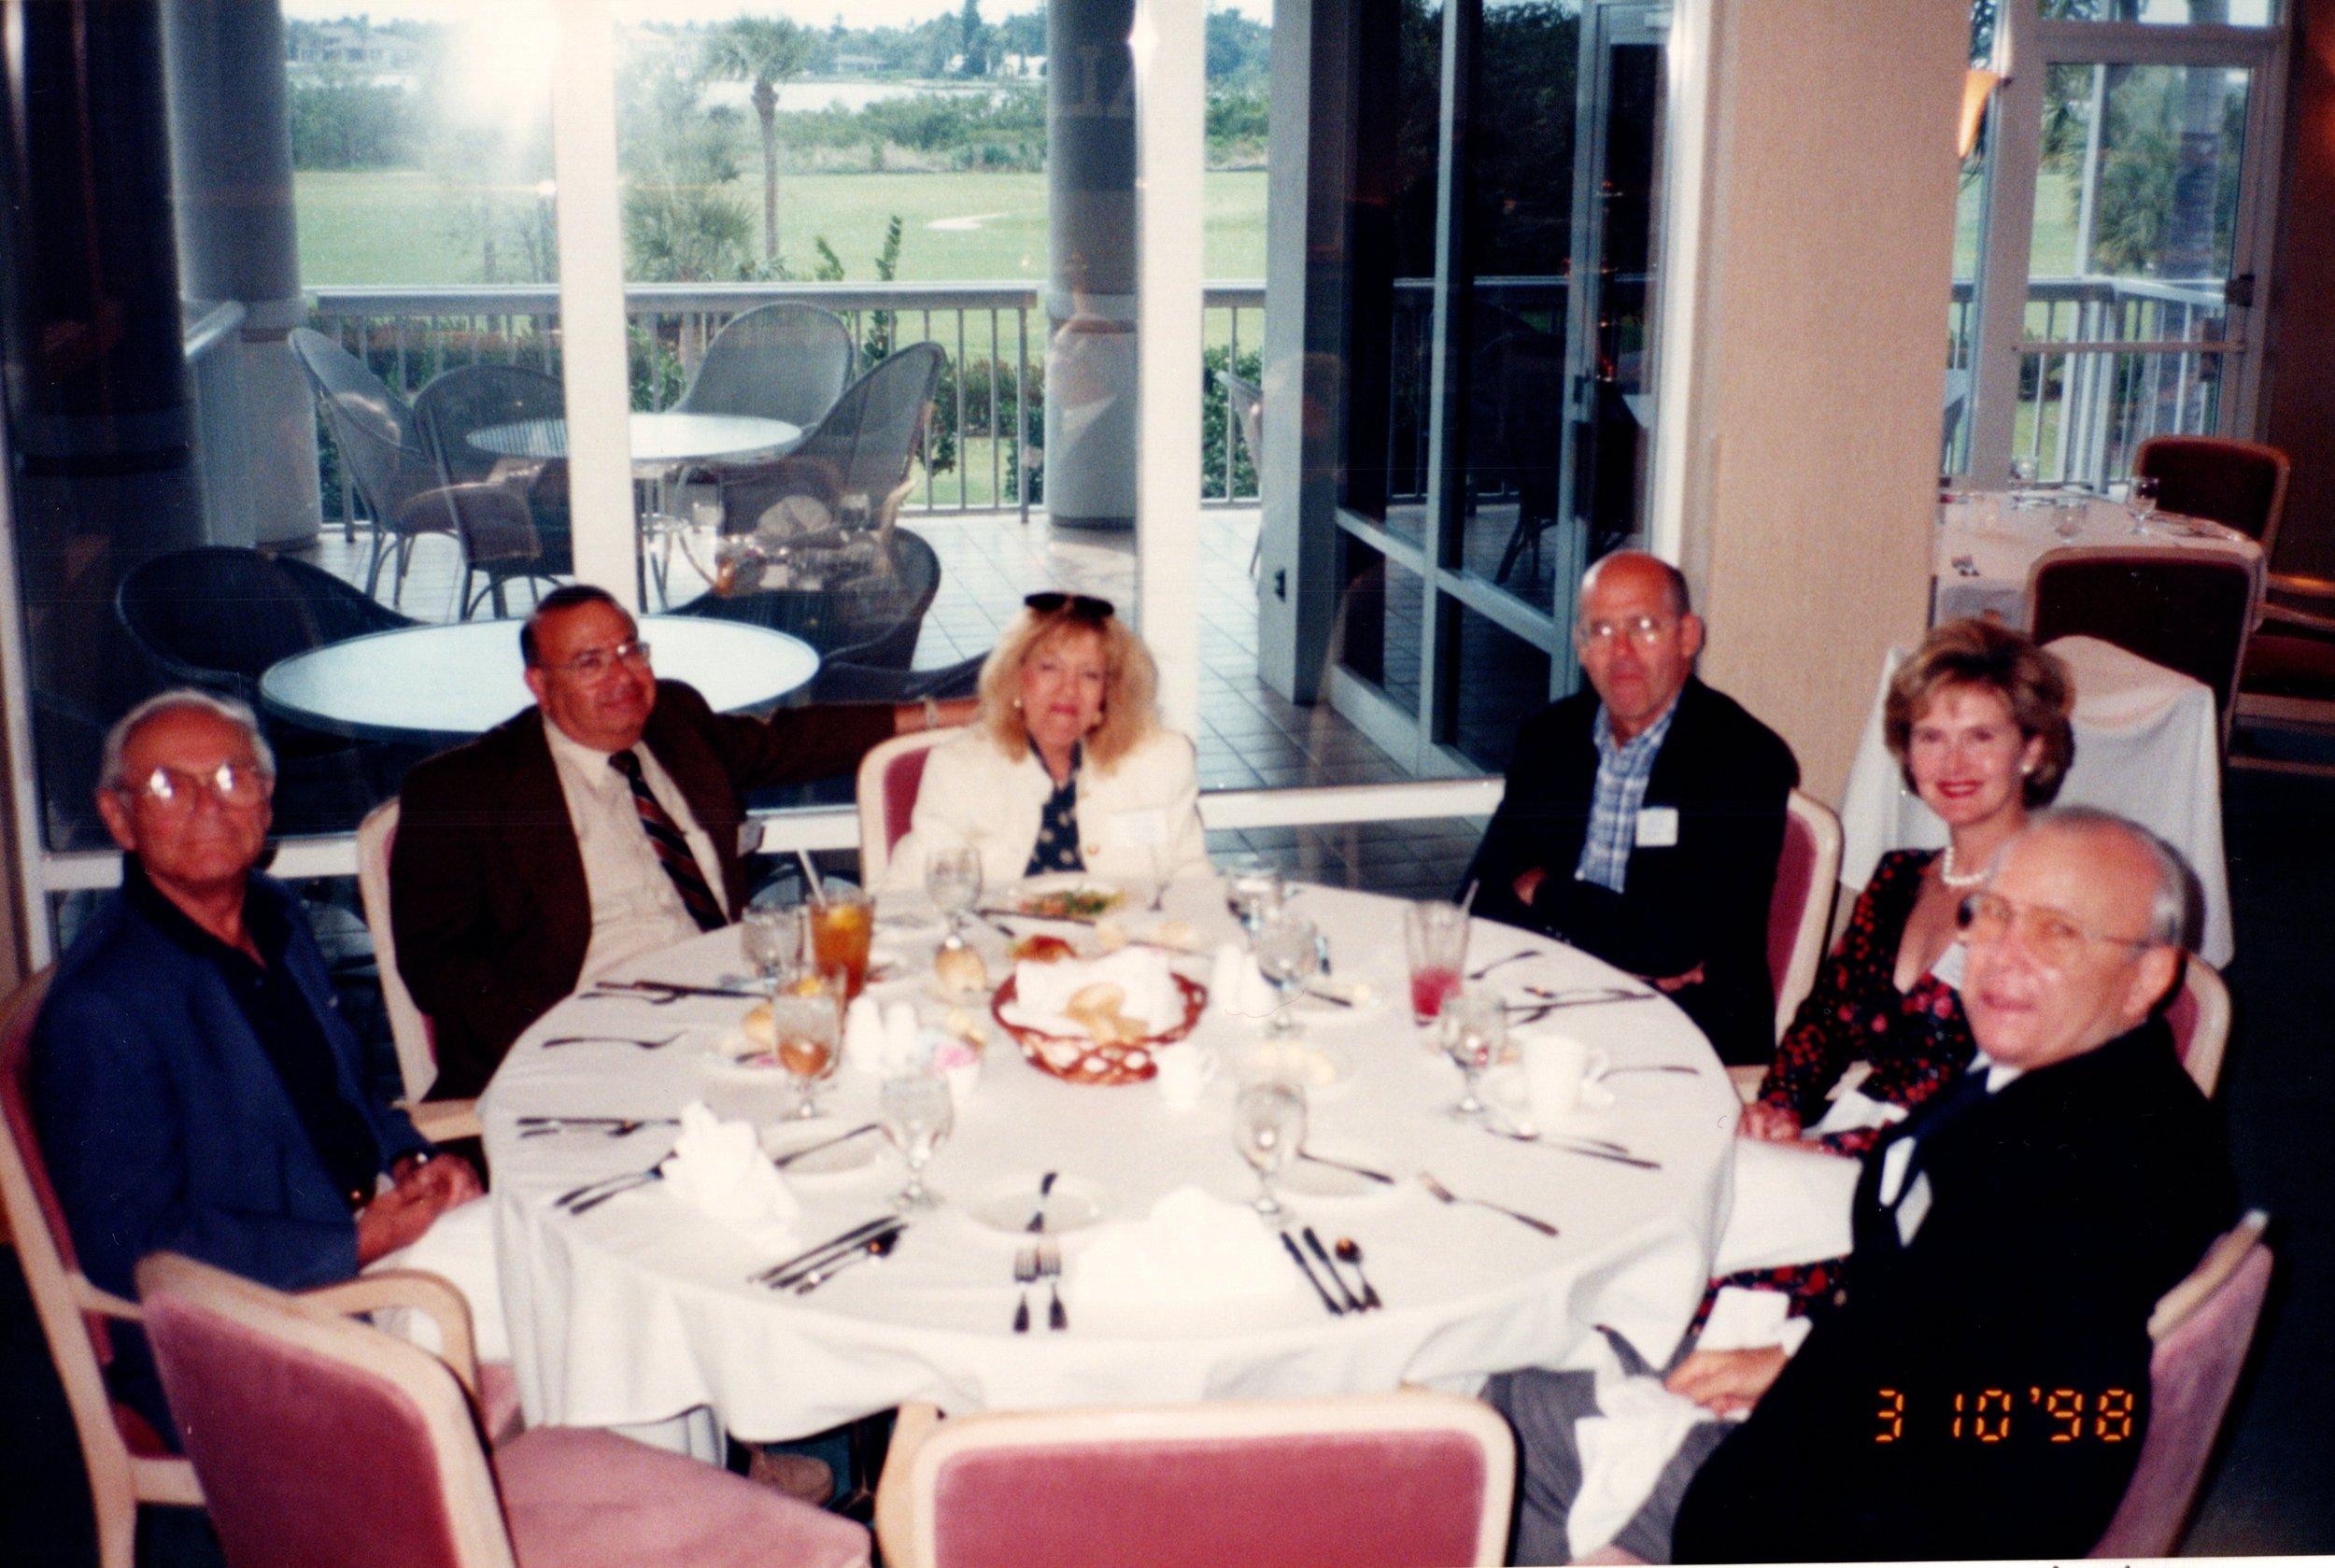 MIRIAN AND BOB KALETT '58, MICHAEL AND SHERRY O'HEARN, BOB HANEMER '53E